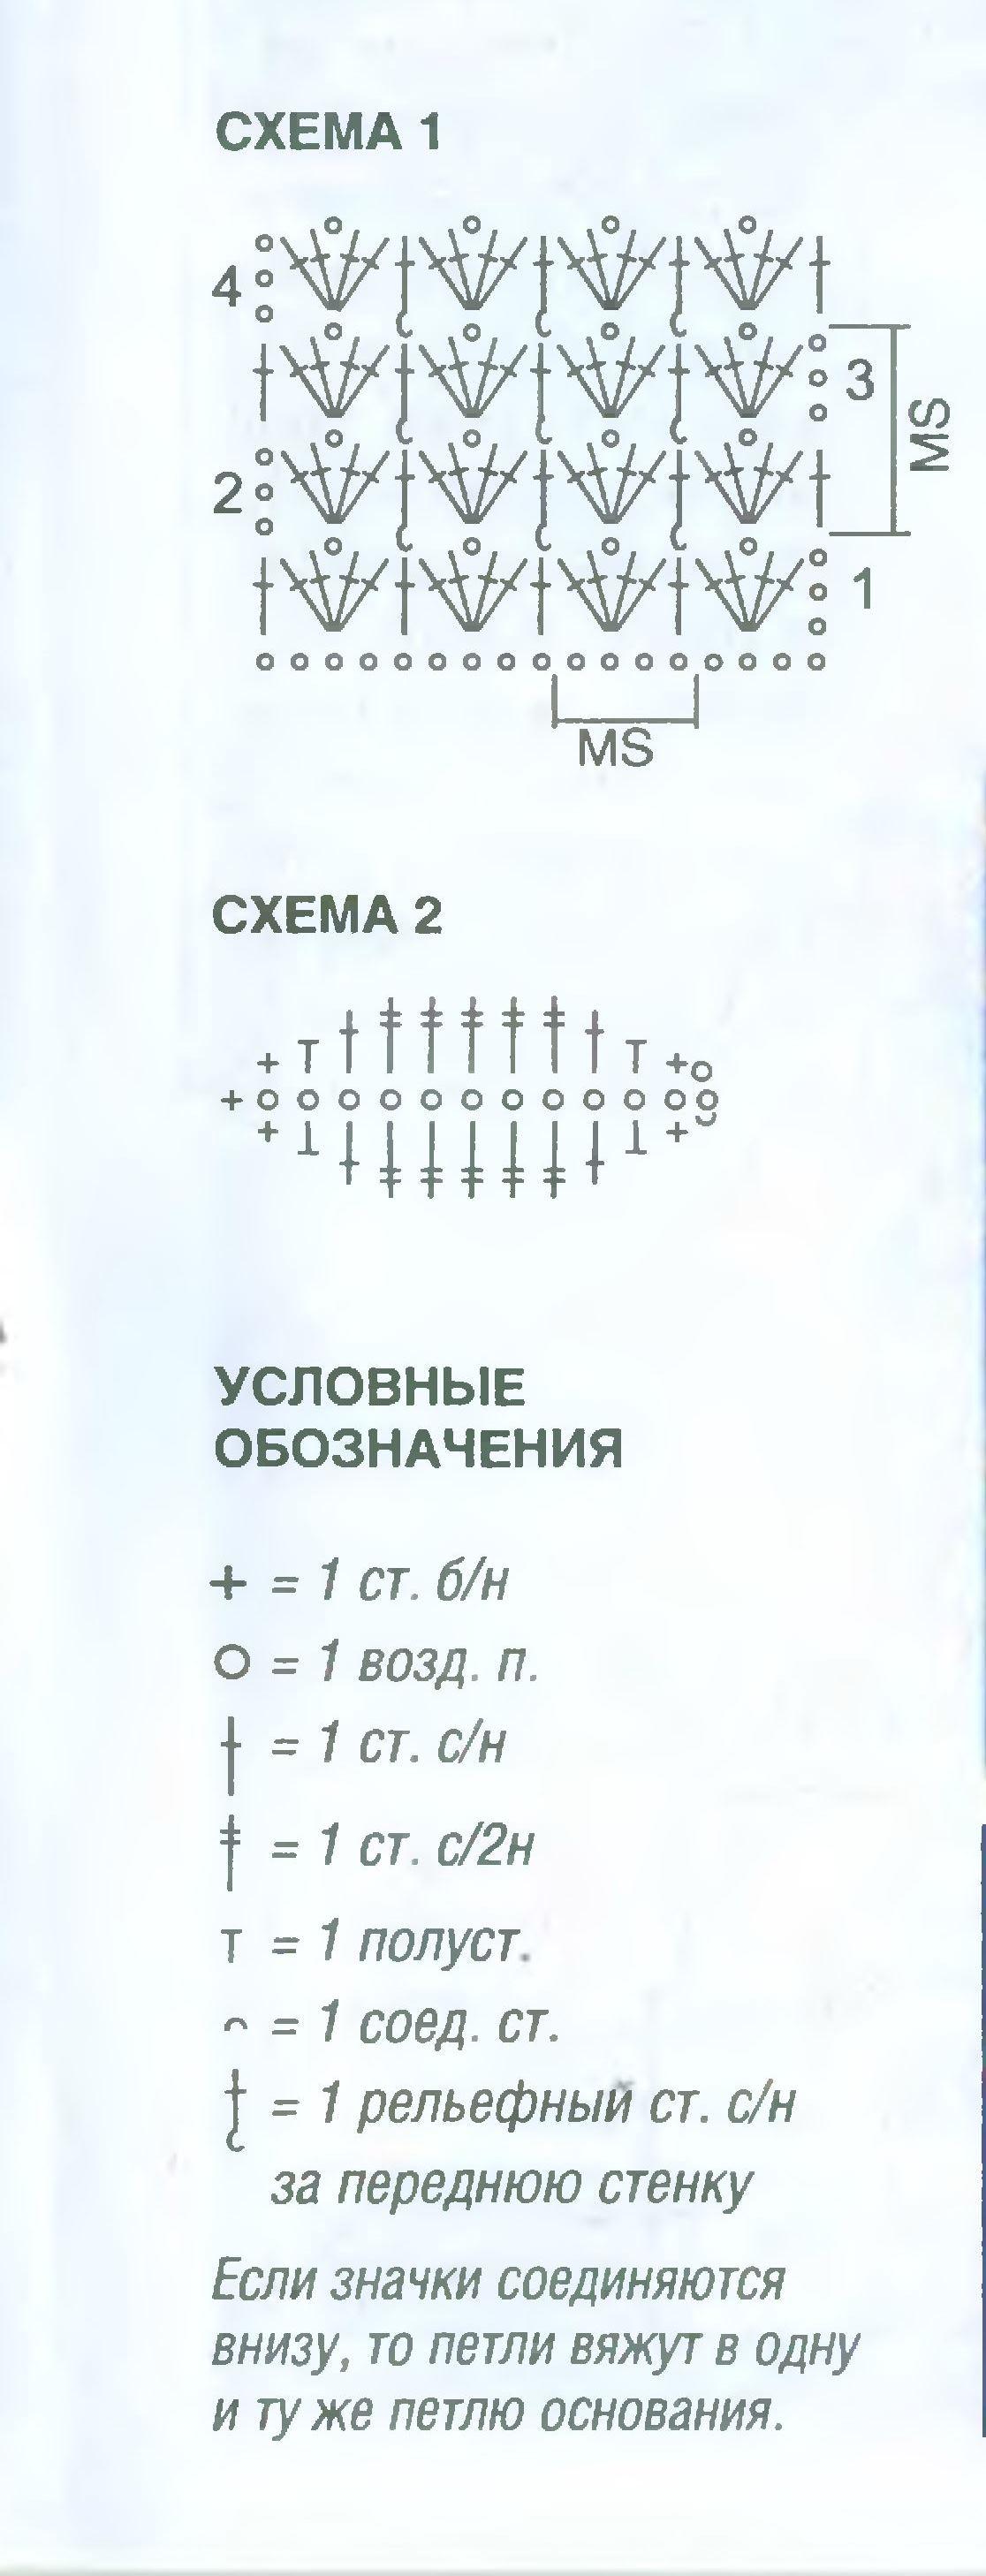 1671_62482938478237489278943 (3)